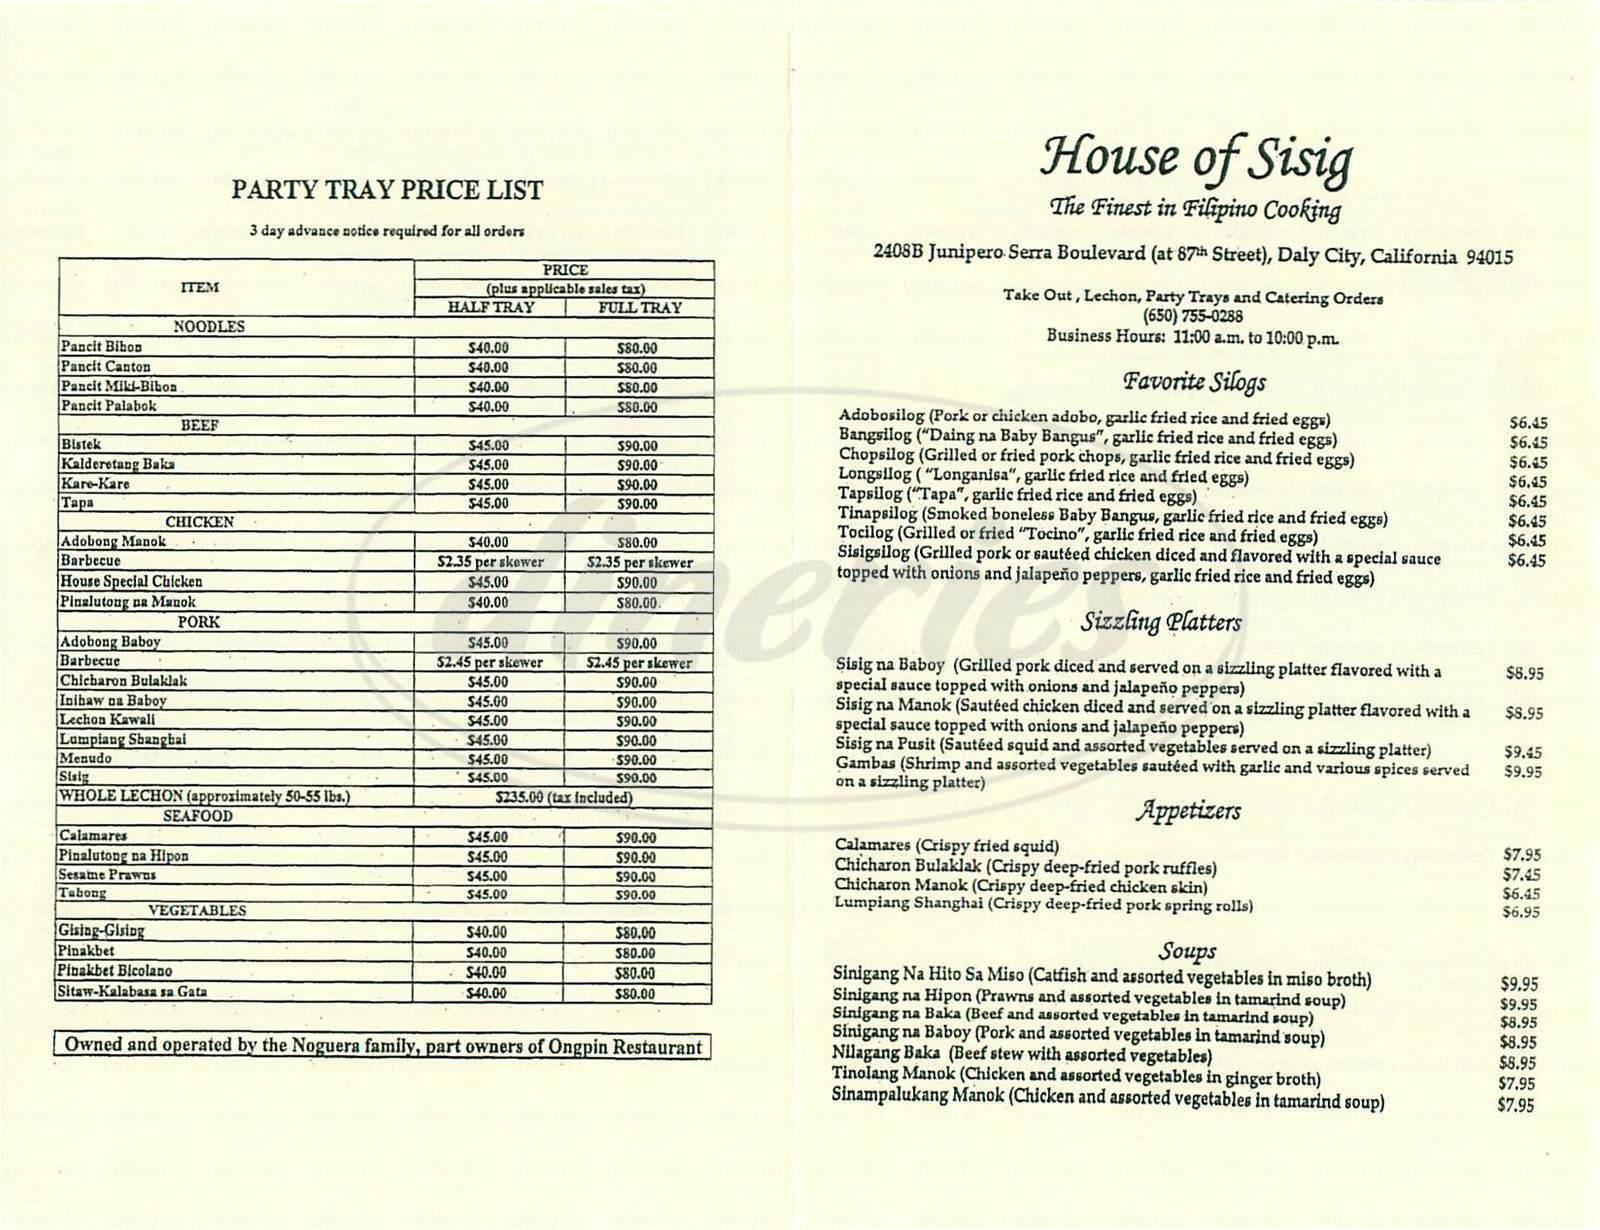 menu for House of Sisig